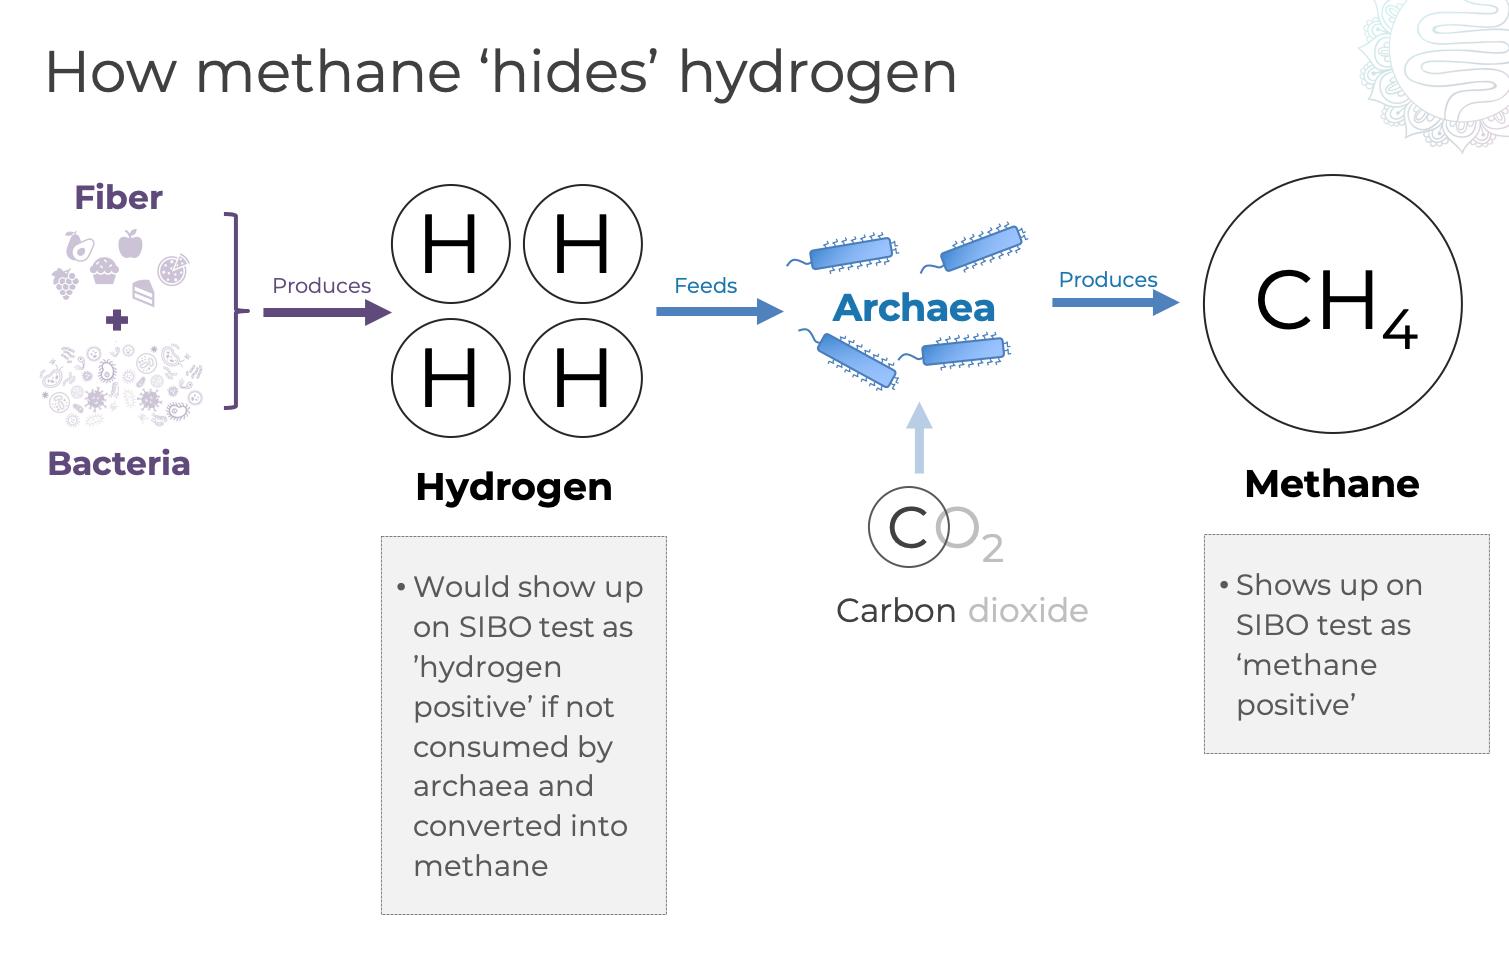 SIBO hydrogen hides methane